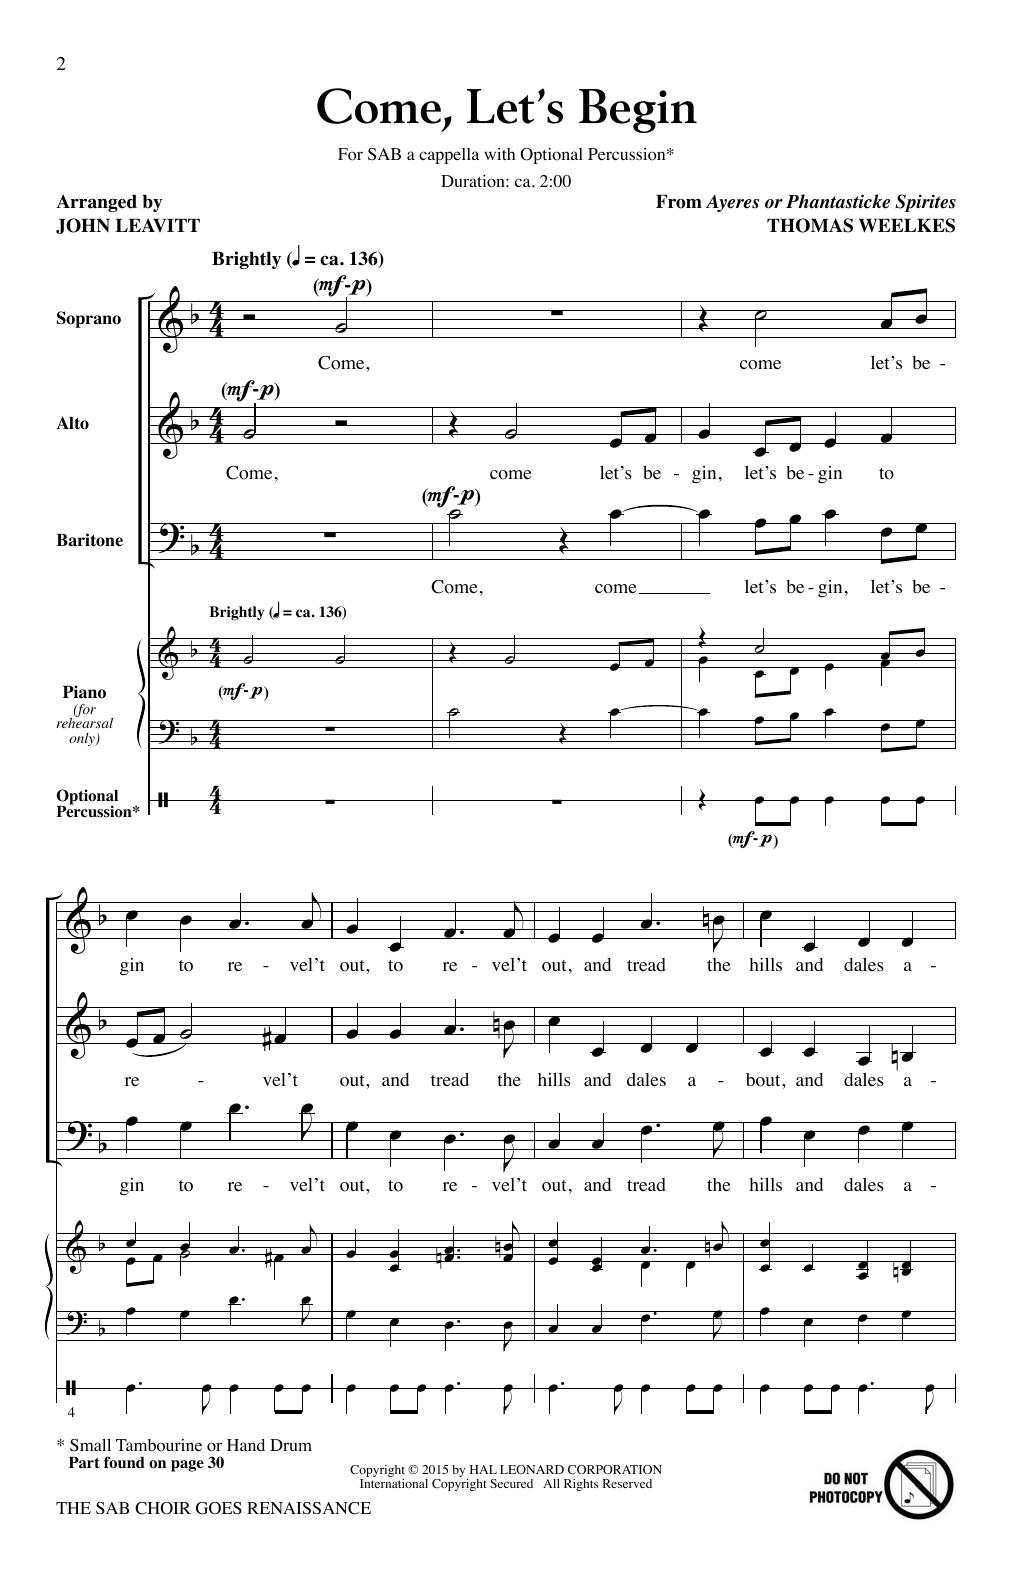 John Leavitt The SAB Choir Goes Renaissance sheet music notes and chords. Download Printable PDF.